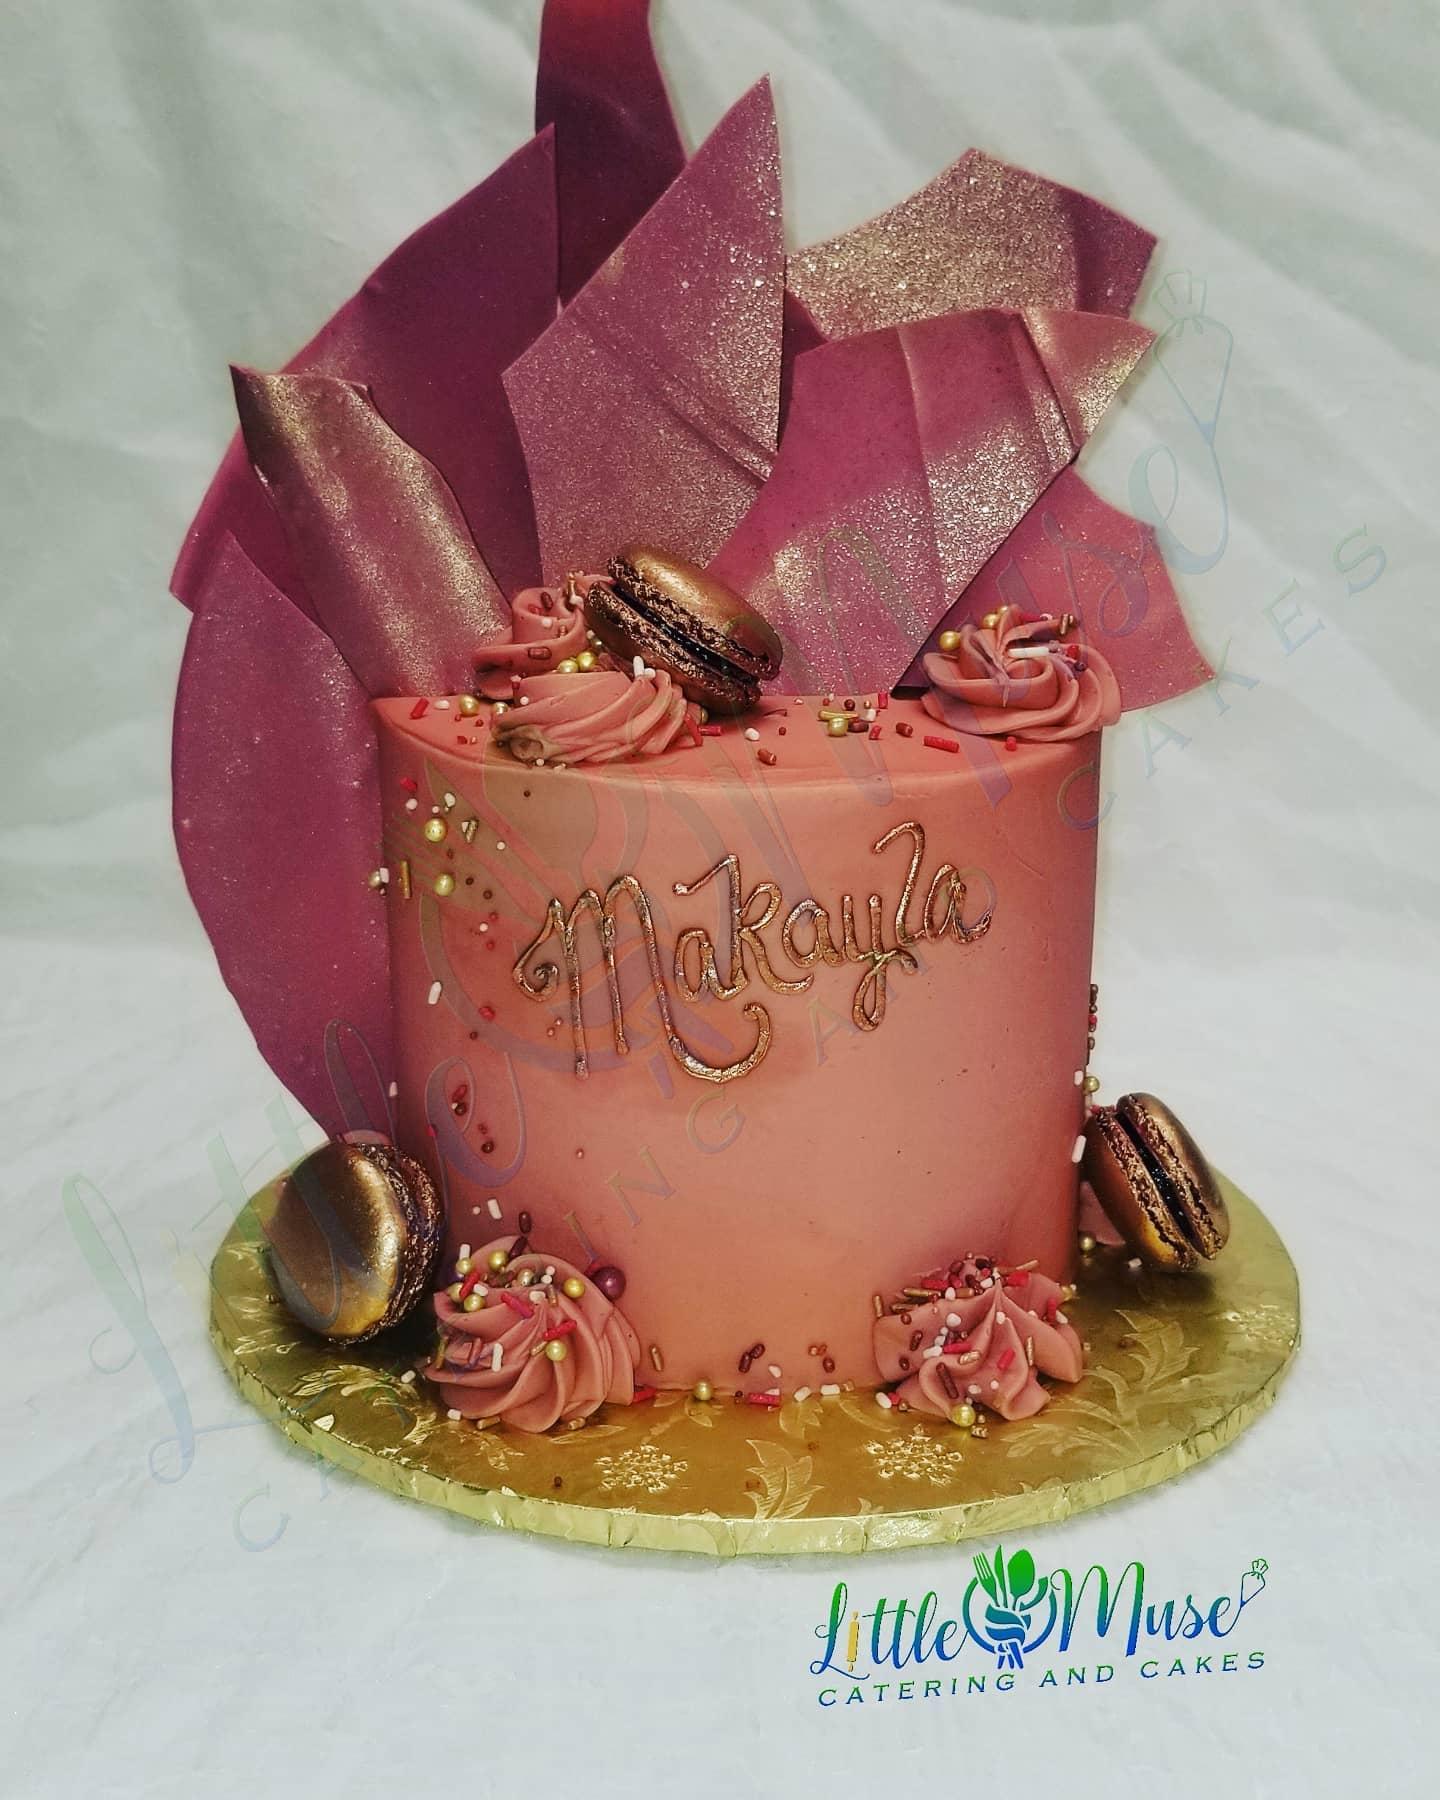 Makayla Chocolate work